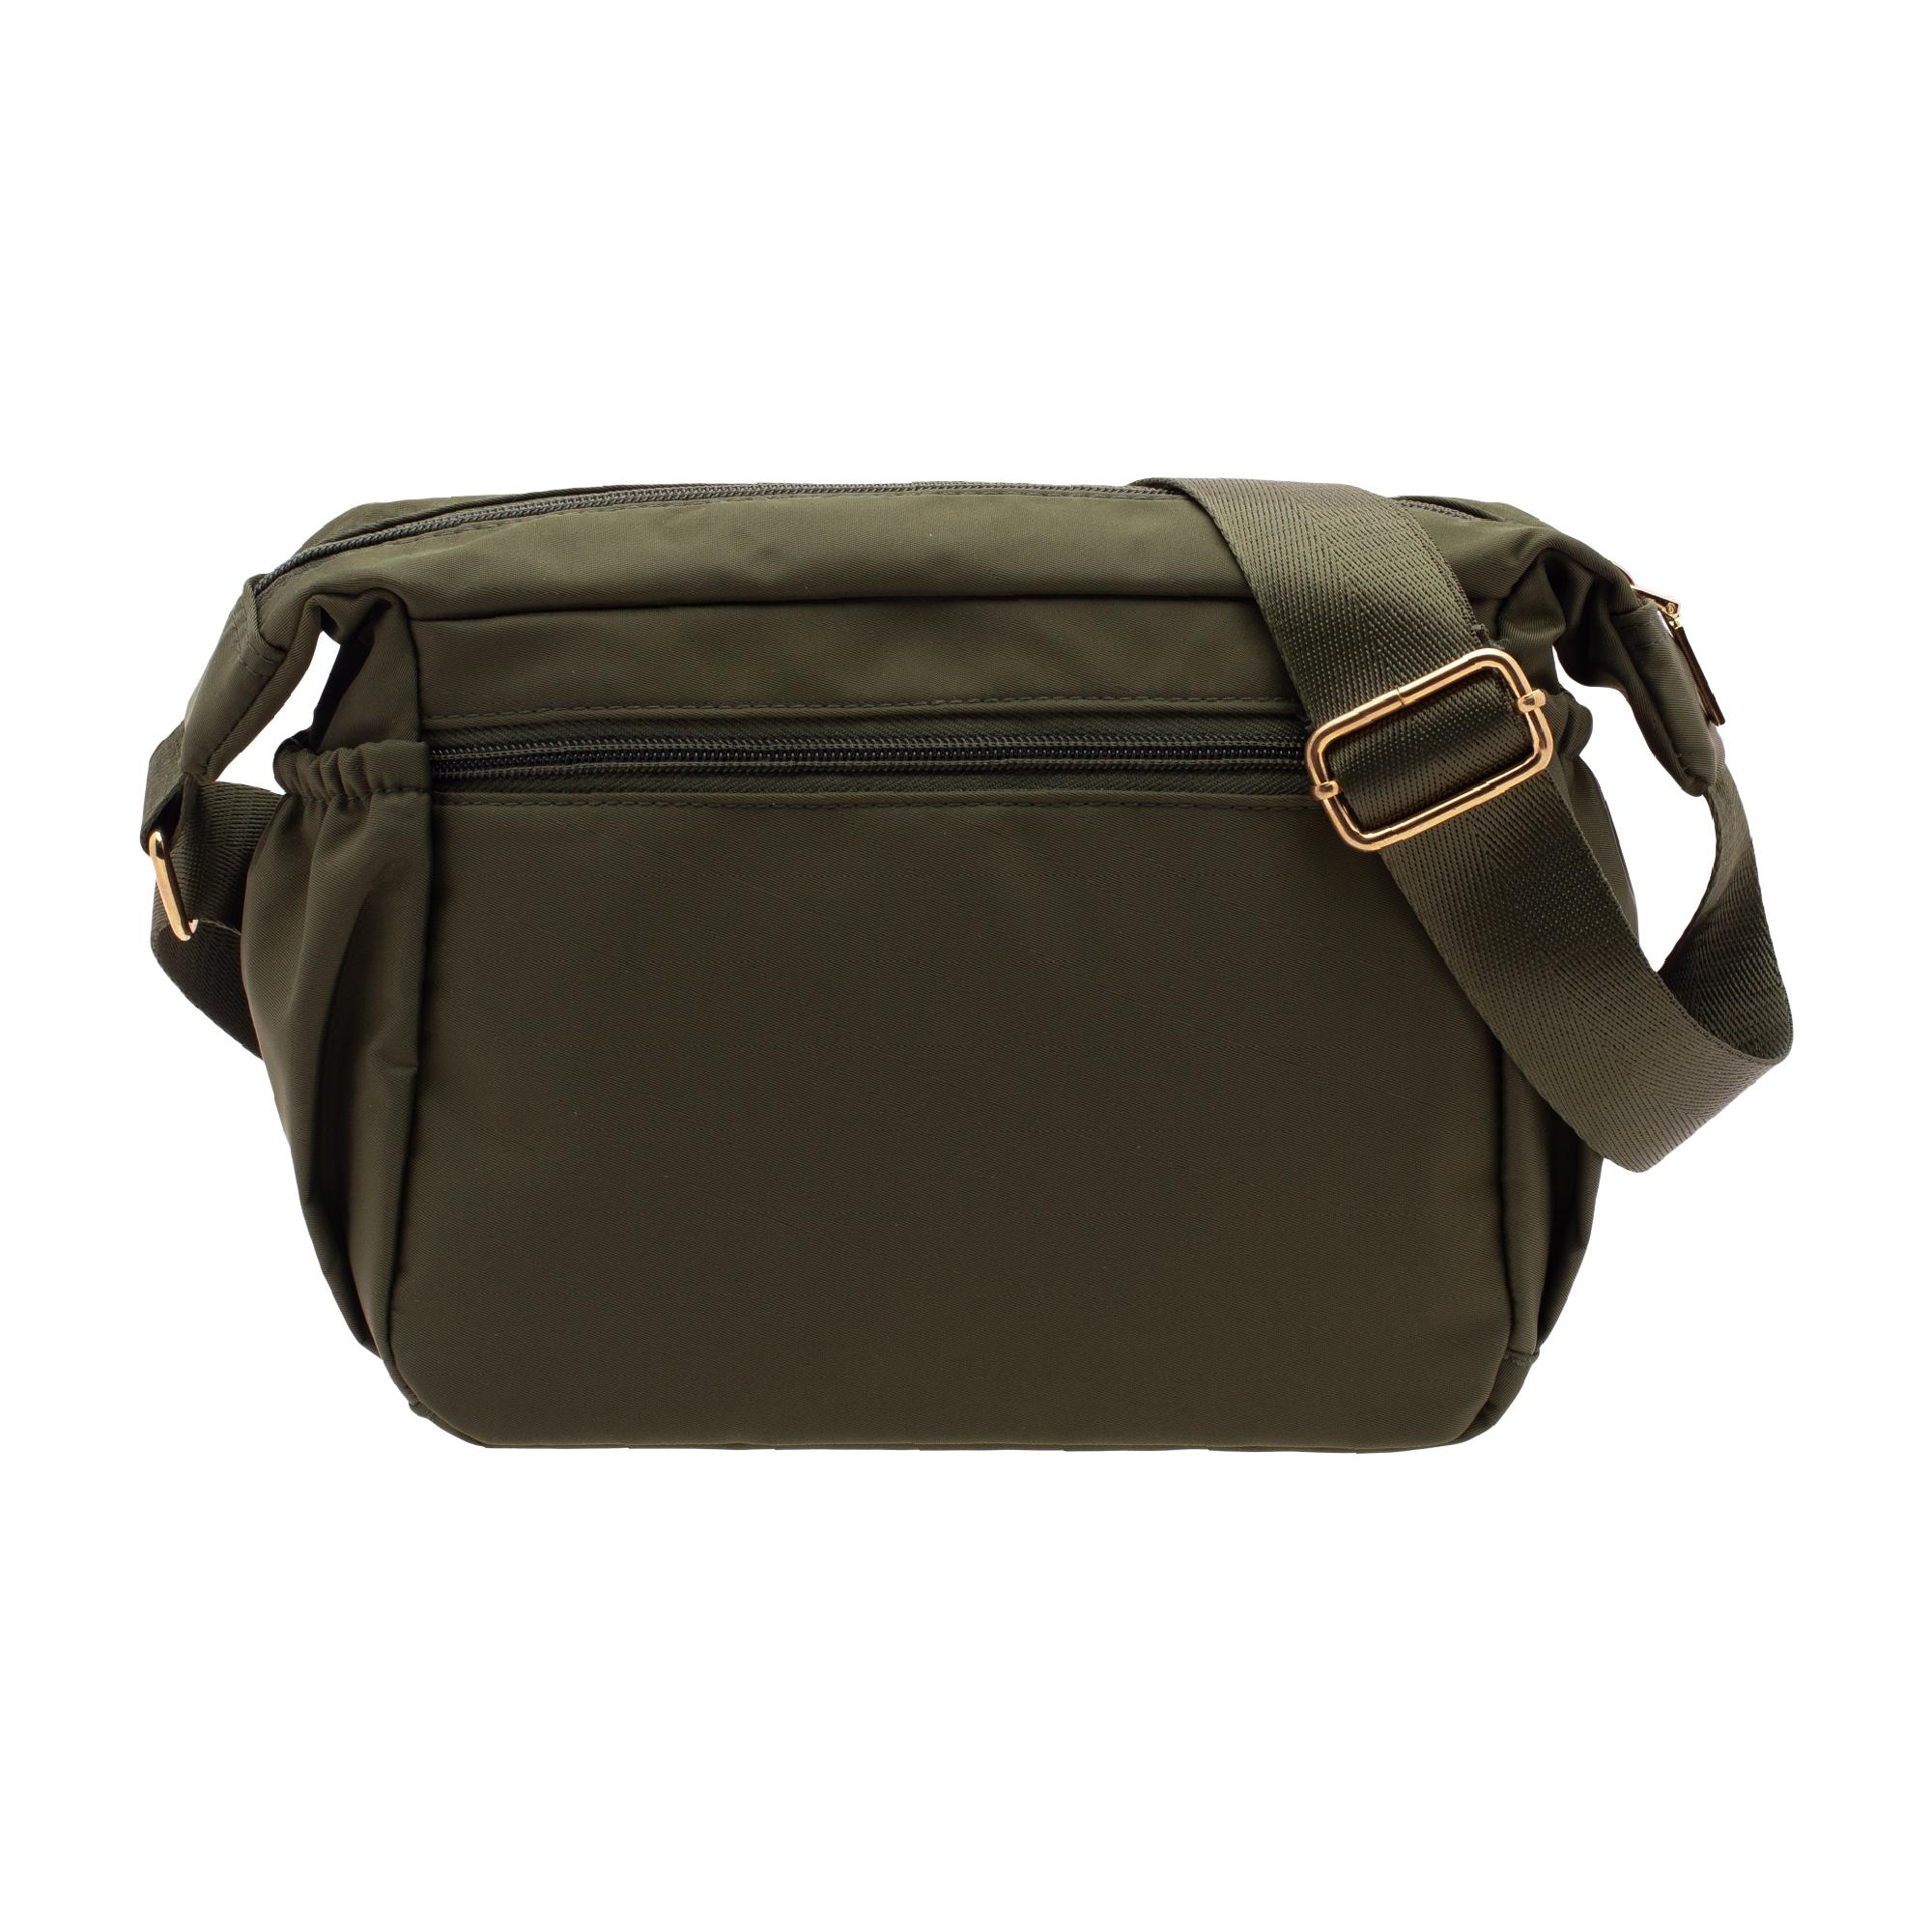 San Prisco Poloclub Nylon Sling Bag